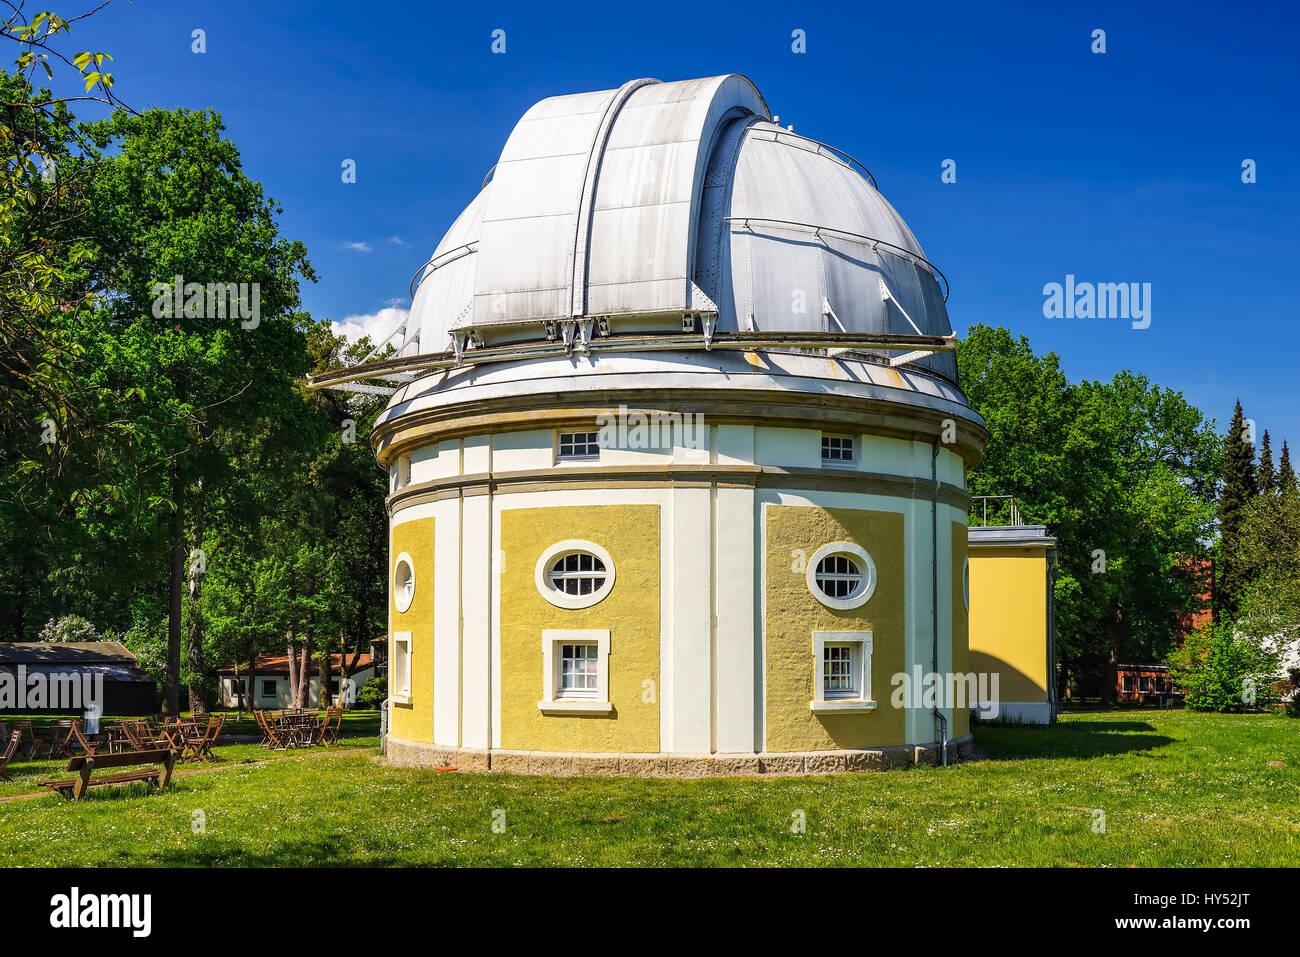 Observatory of Hamburg, building of the 1-m-reflecting telescope in mountain village, Hamburg, Germany, Europe, Stock Photo